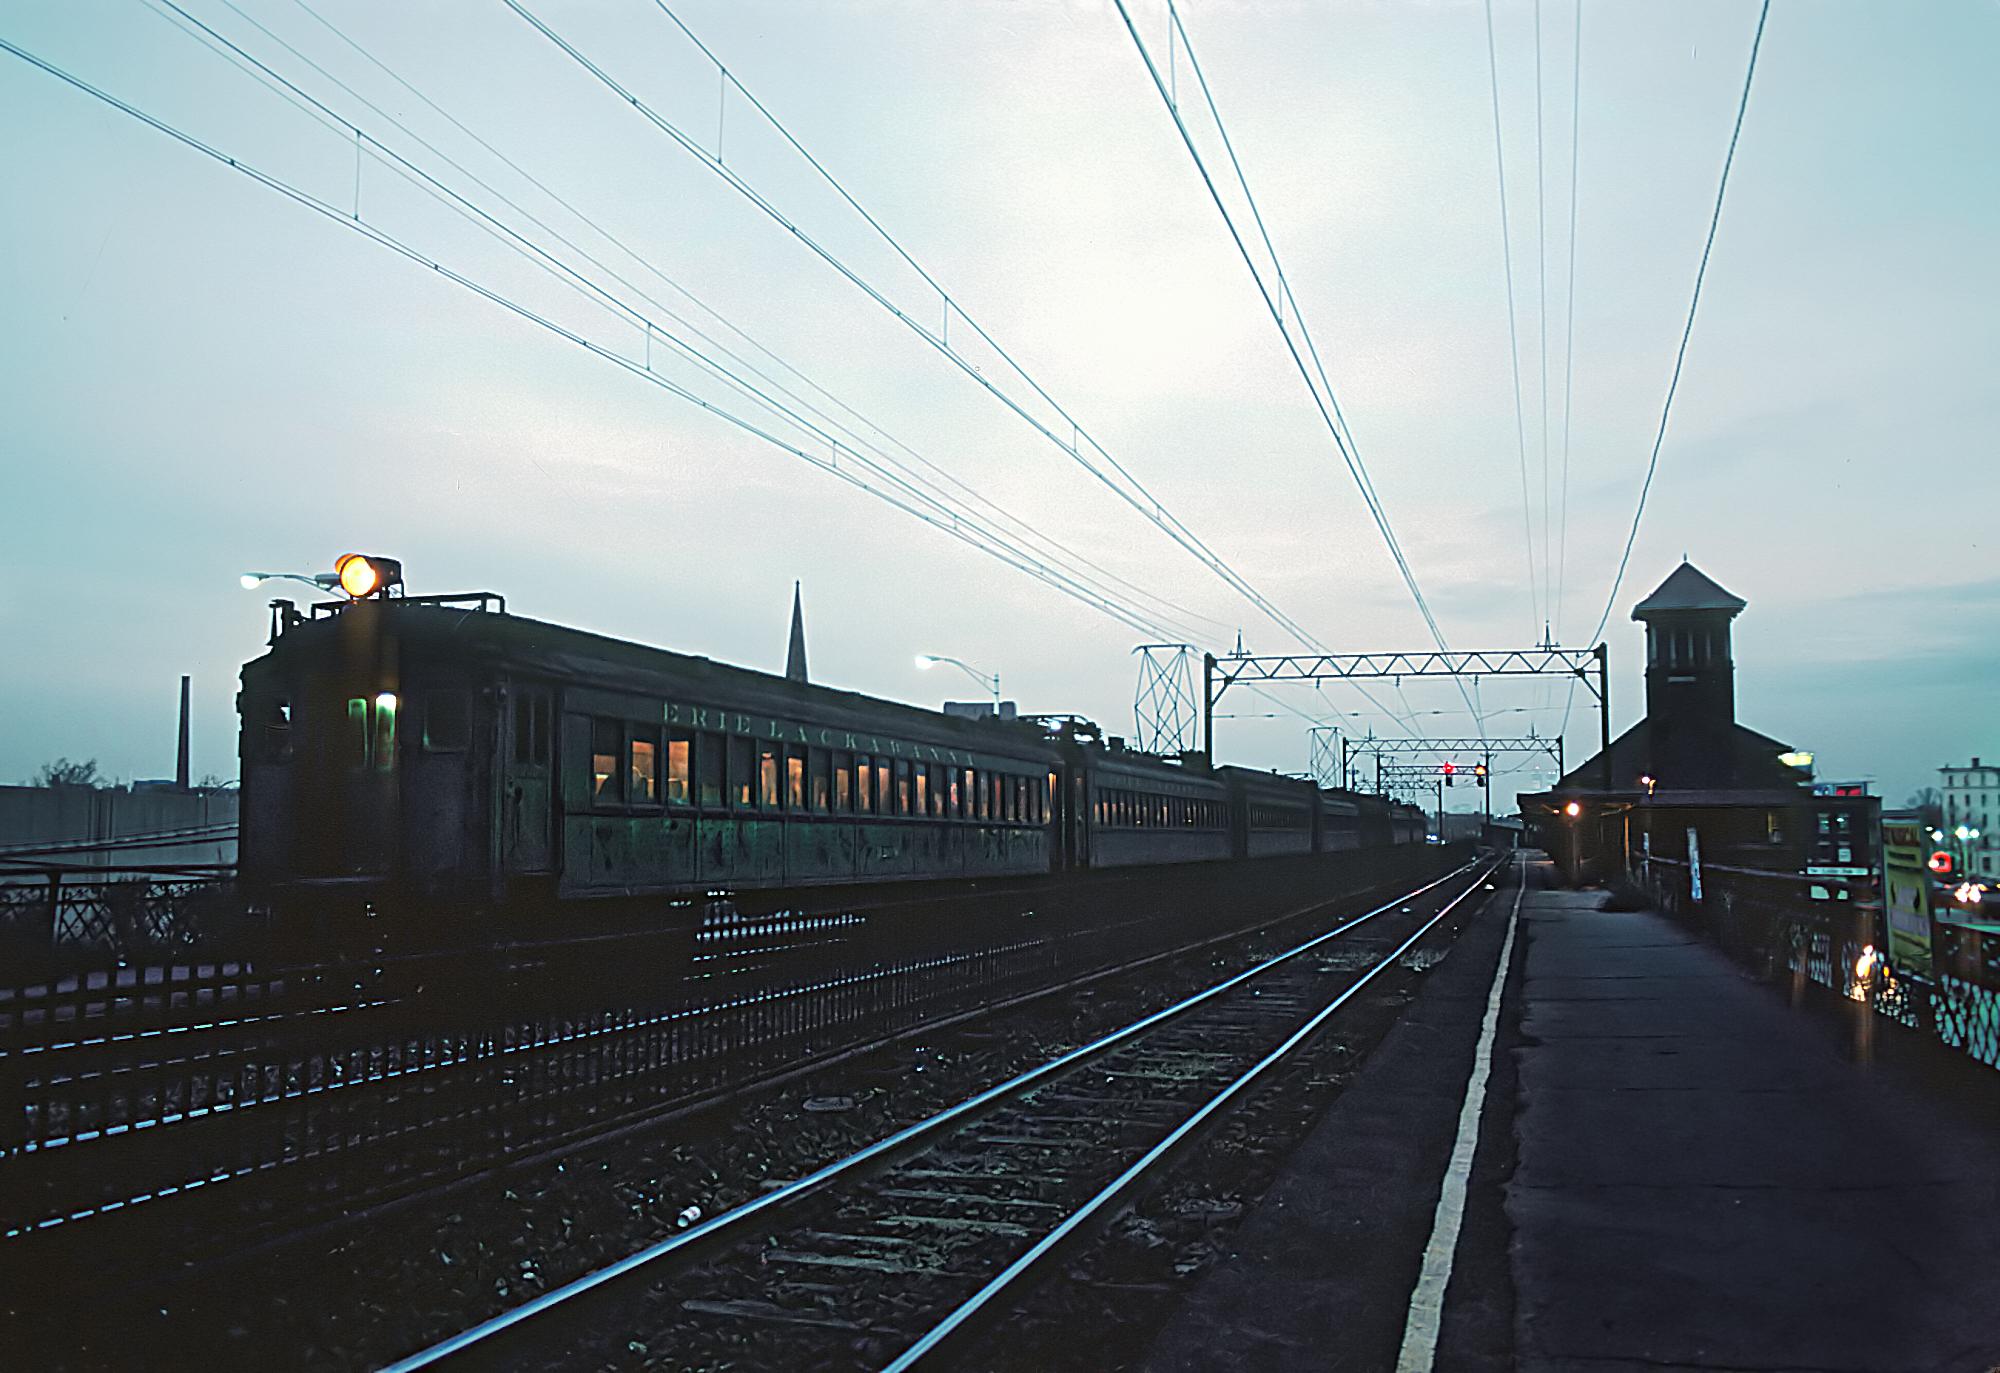 File:EL Newark, Lackawanna Station, Newark, NJ, November